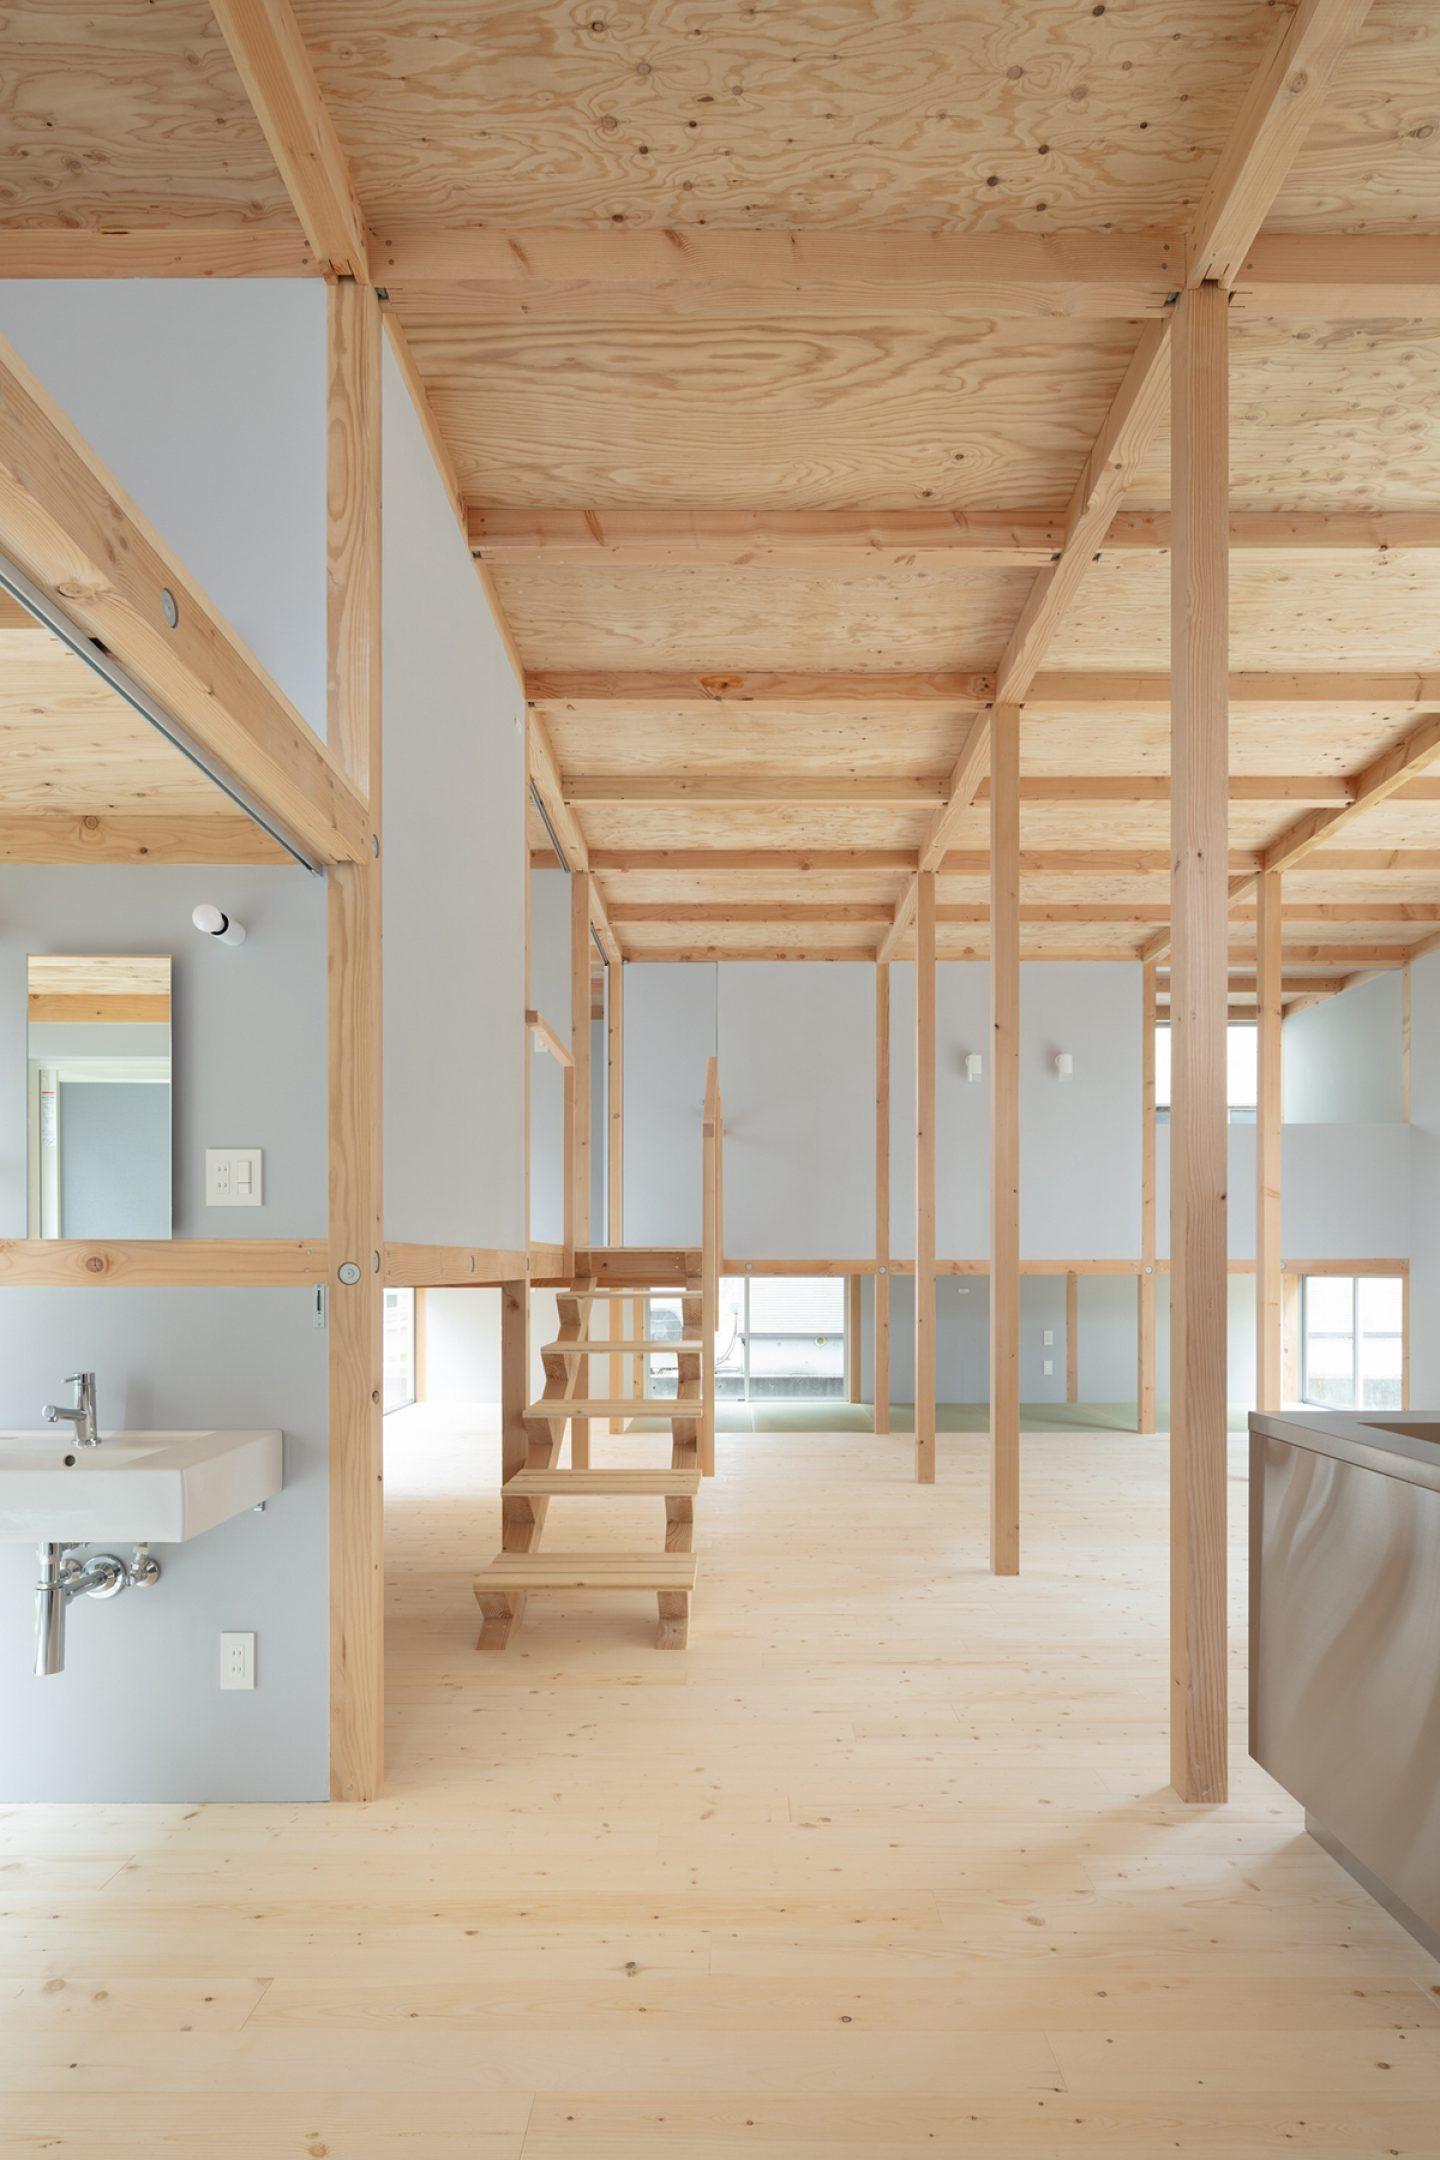 IGNANT-Architecture-Naoya-Kitamura-Koda-Townhouse-10